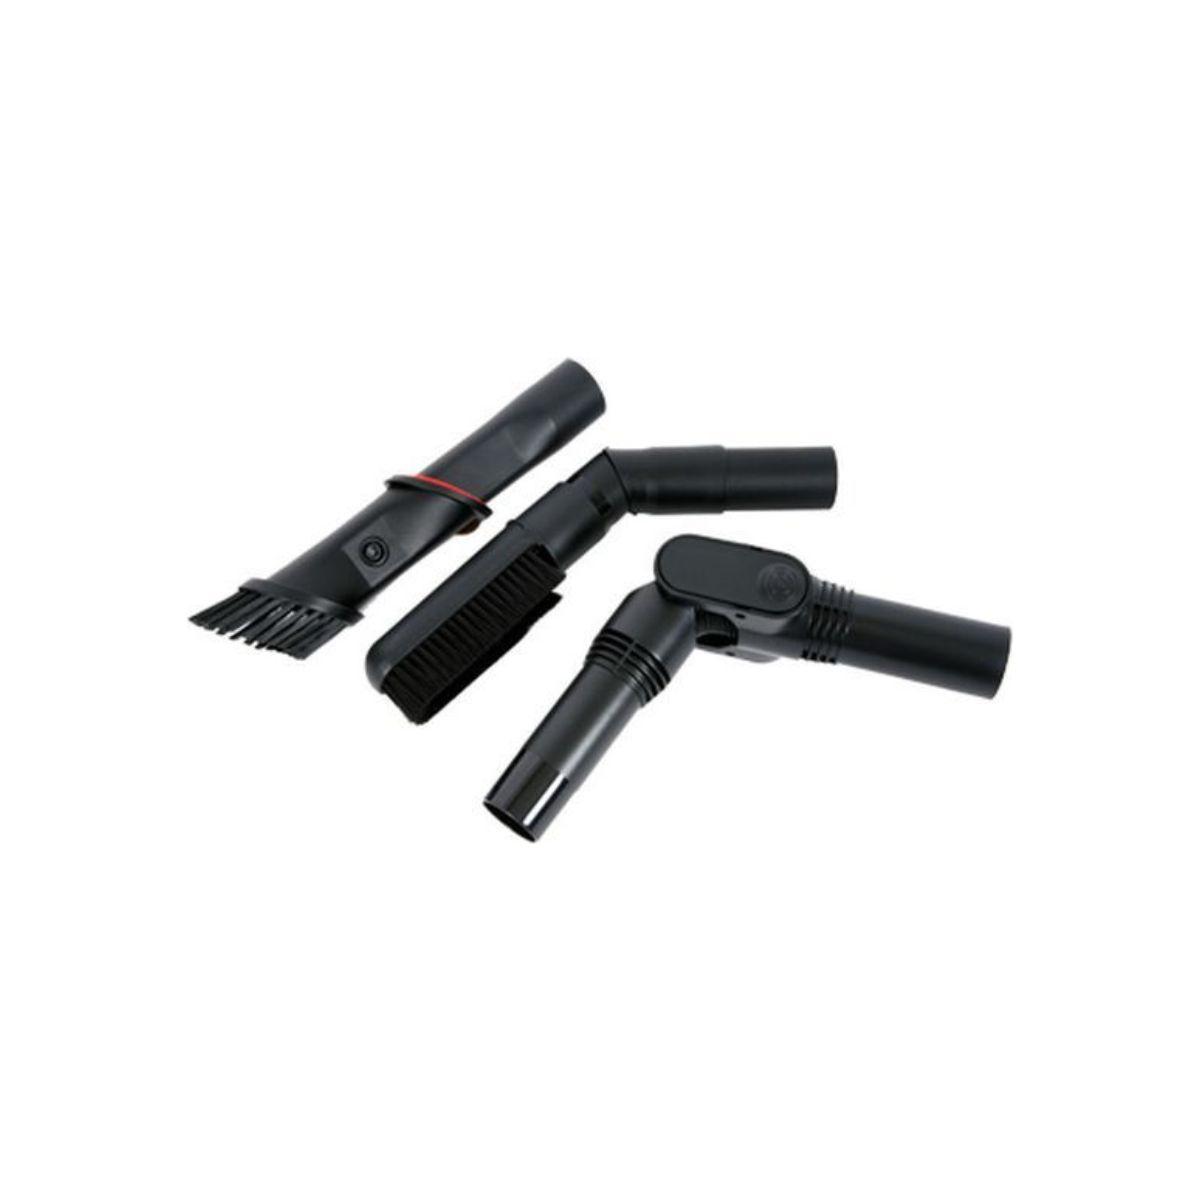 Adaptateur flexible ROWENTA Bras articulé Multi-fonction ZR903401